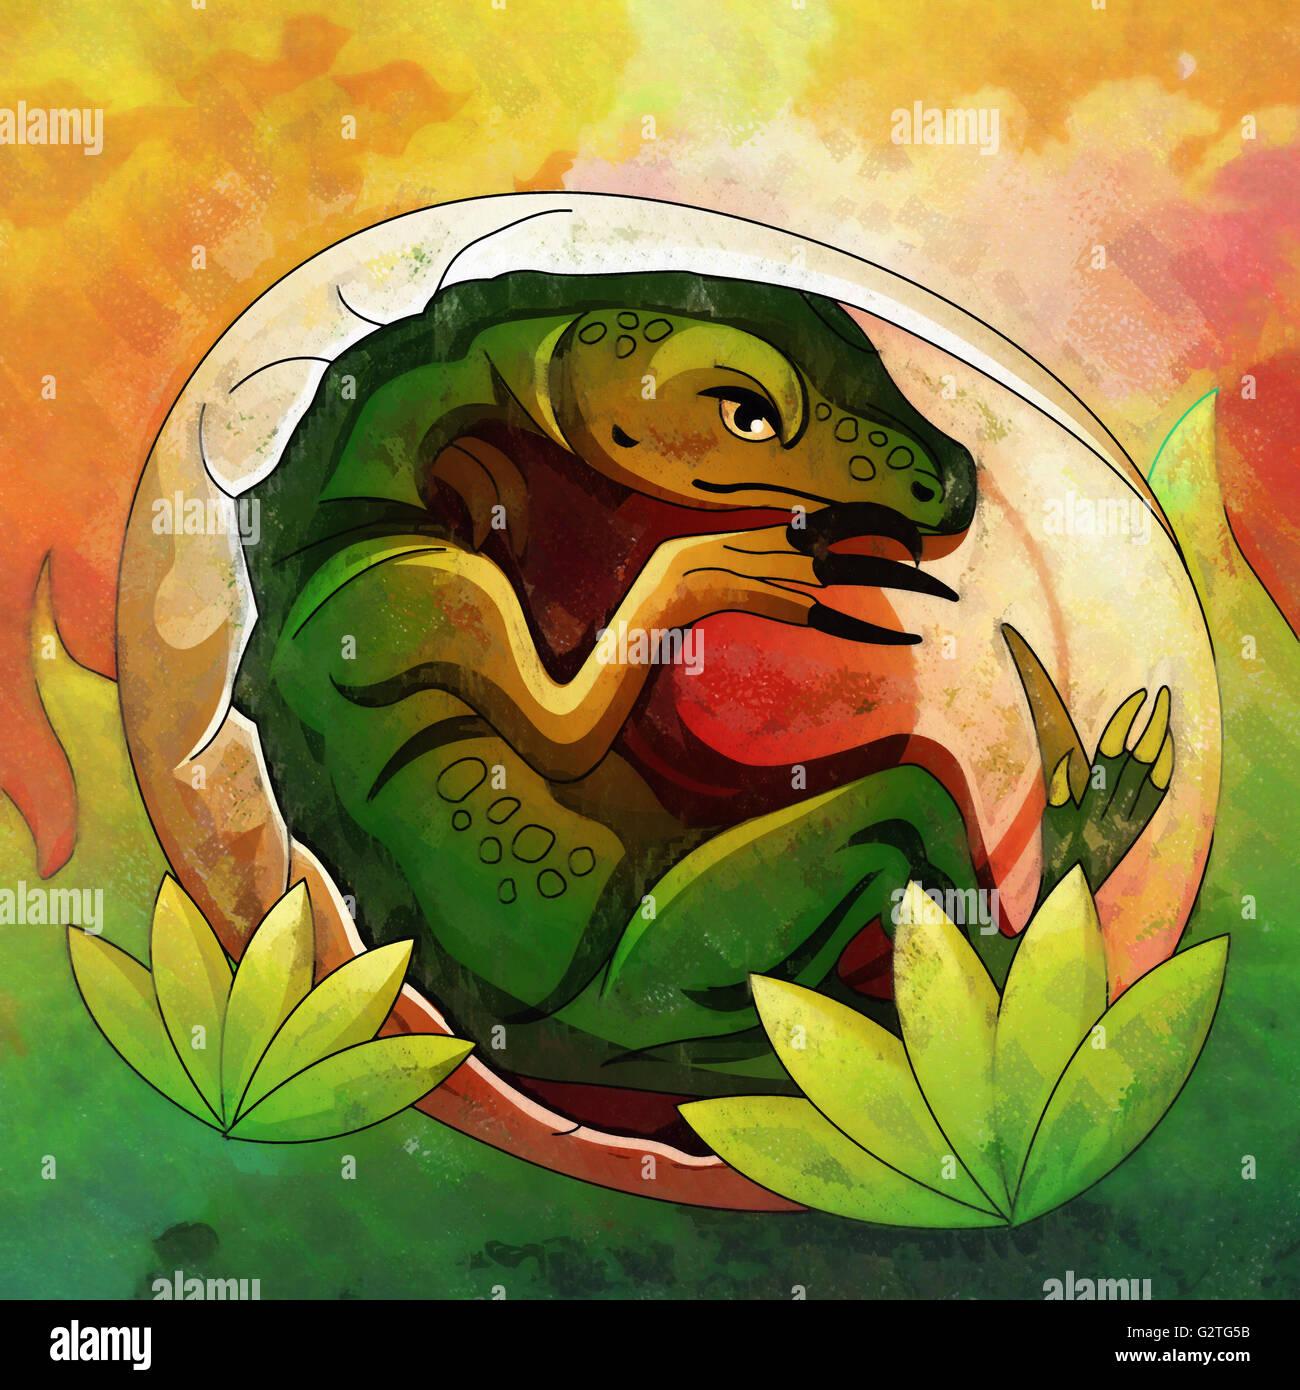 Hatching Dinosaur Egg IIllustration - Stock Image